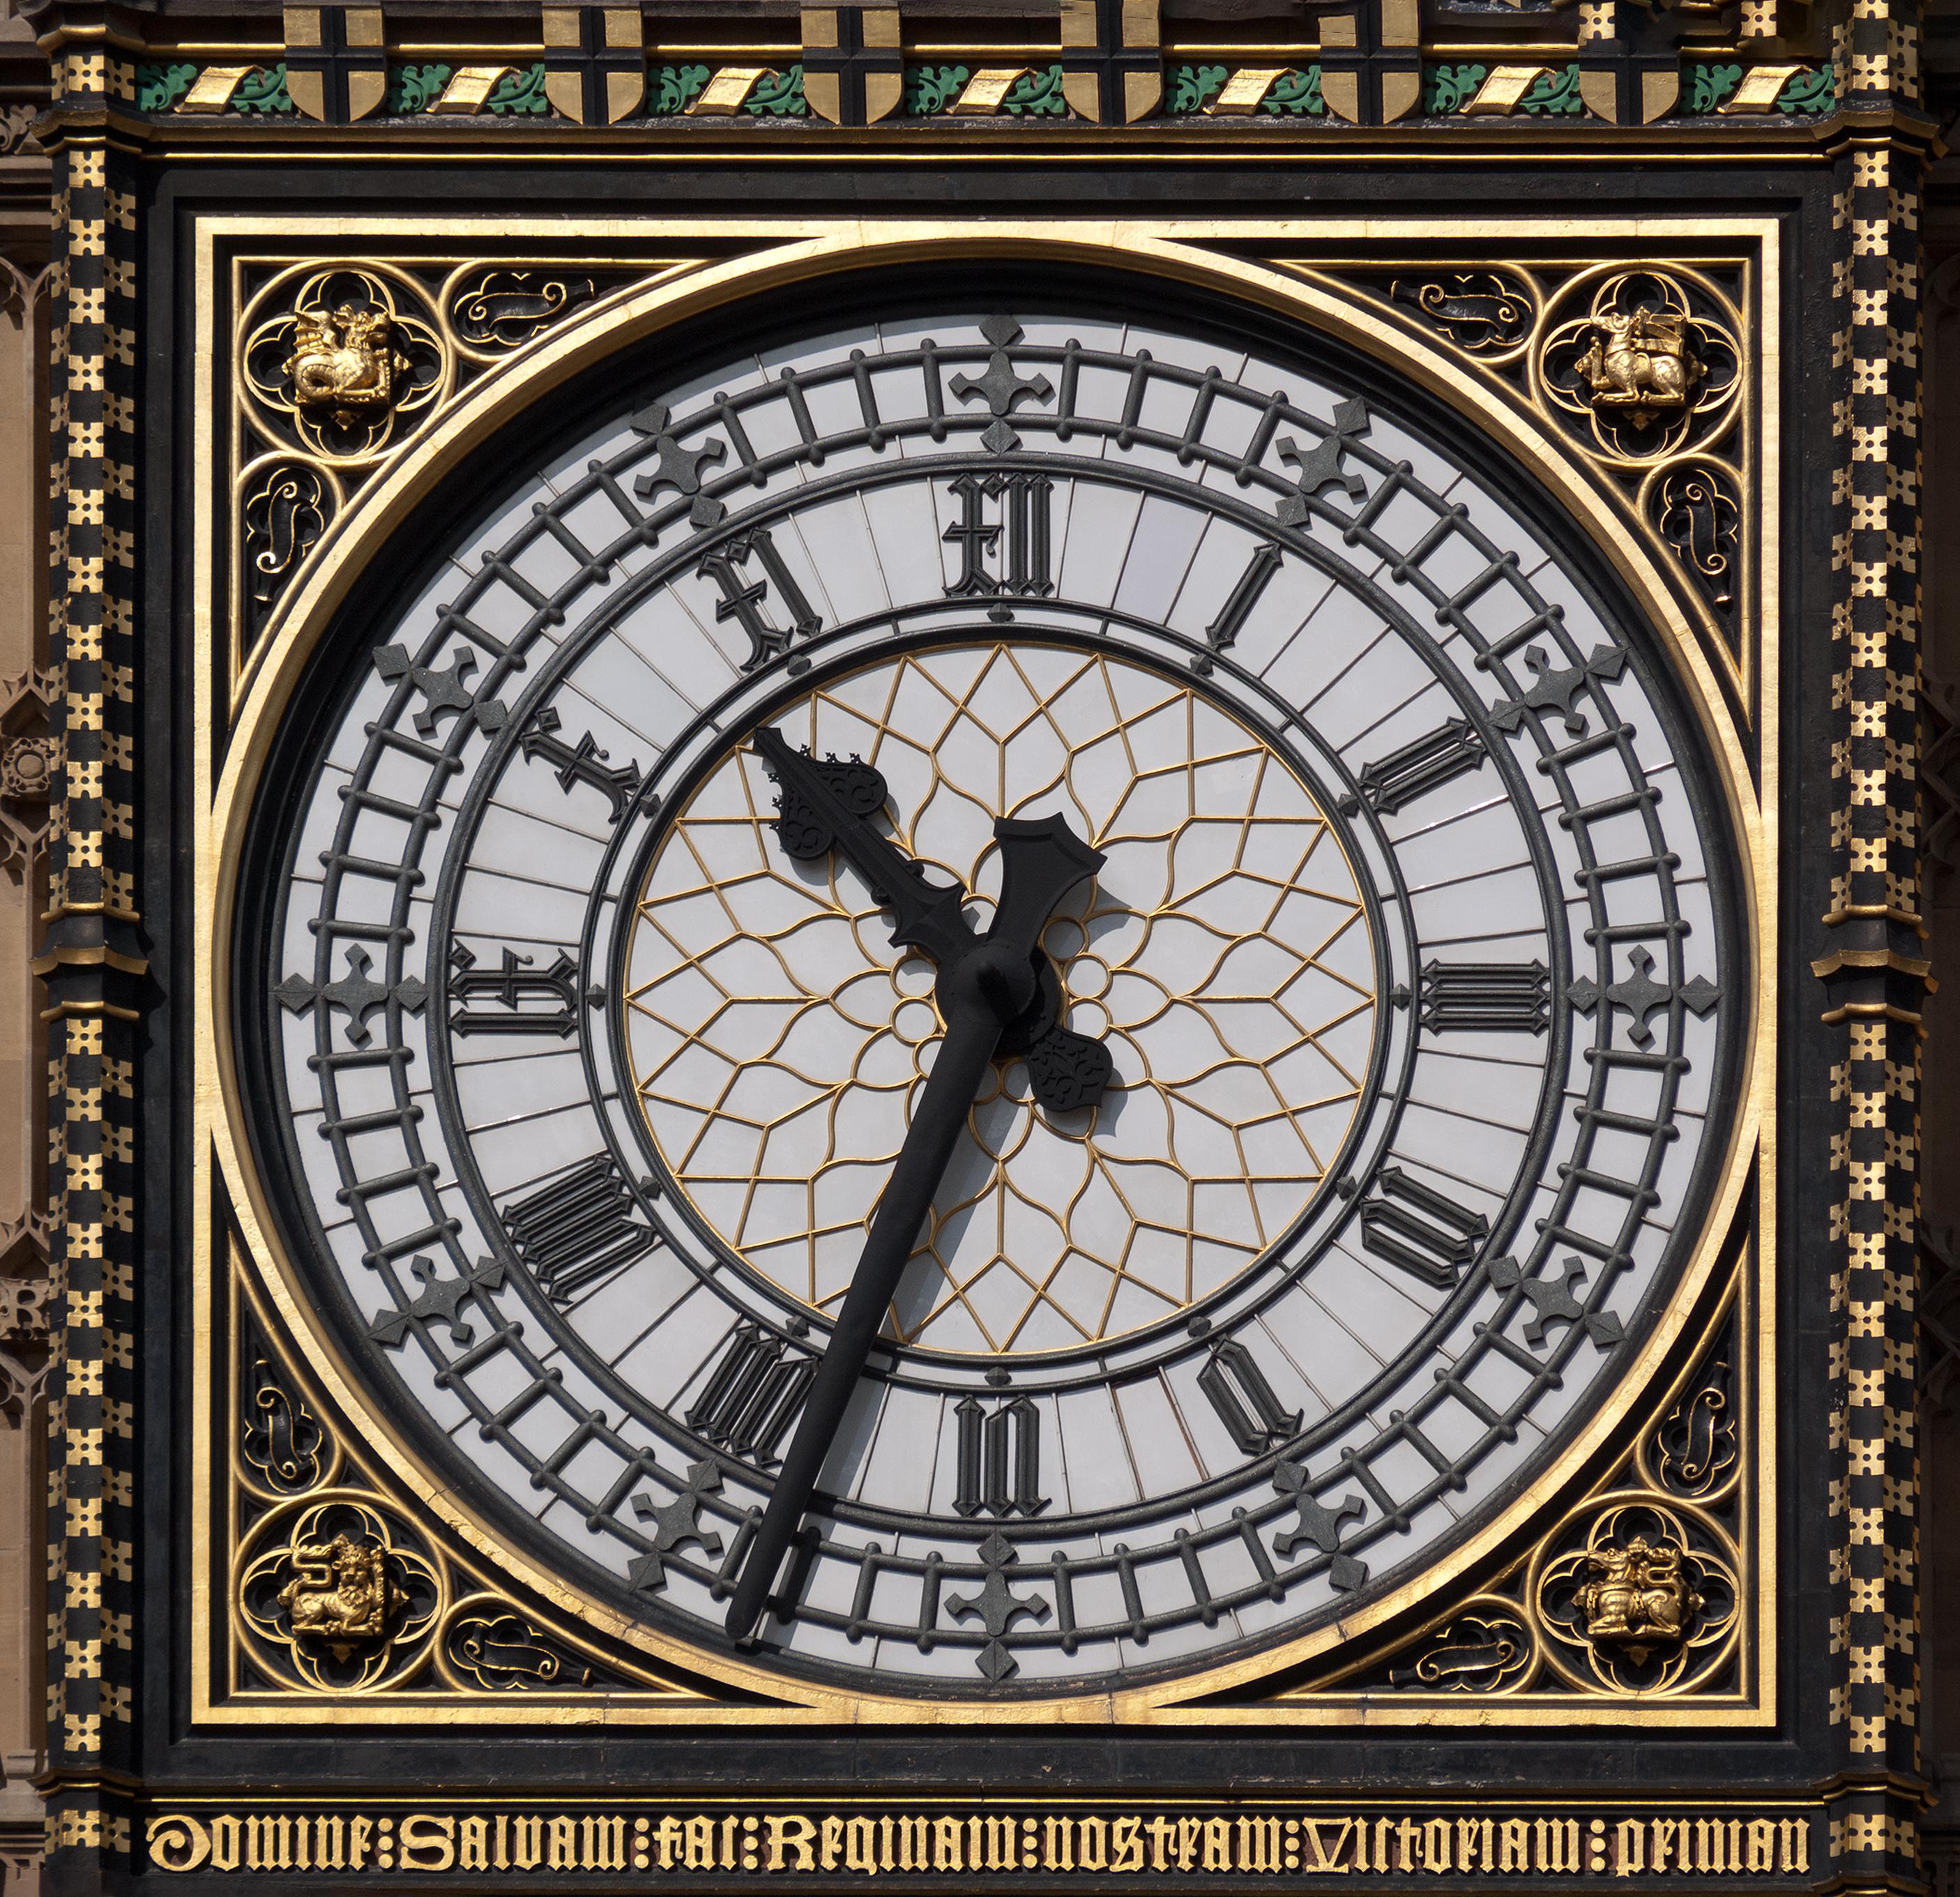 File:London Big Ben Inner Clock Face 1070925-PSD.jpg ...